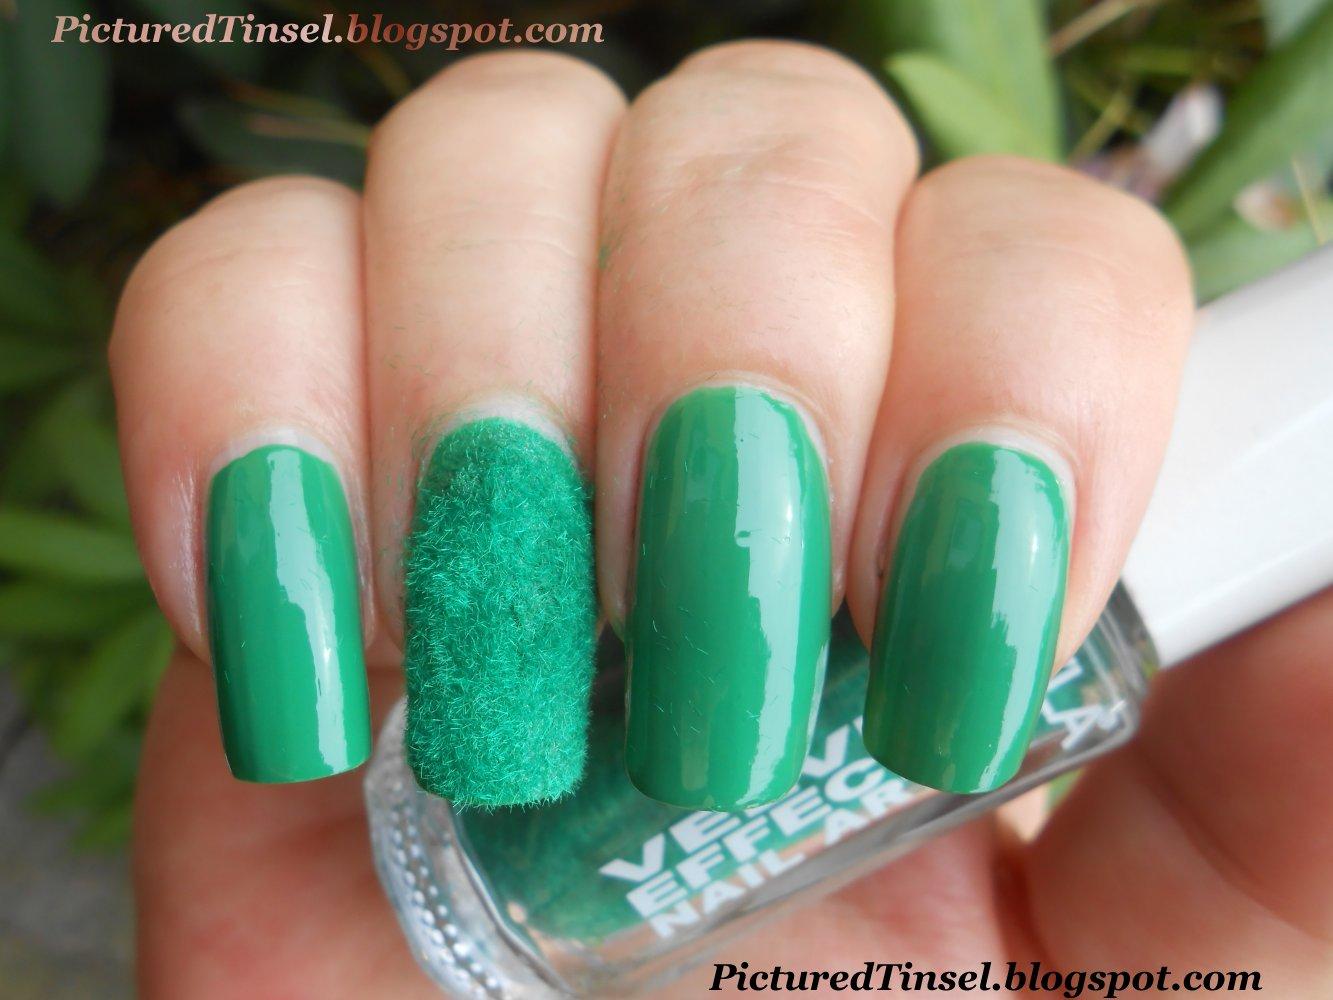 PicturedTinsel: Layla Velvet Effect Nail Art 06 Green Lawn